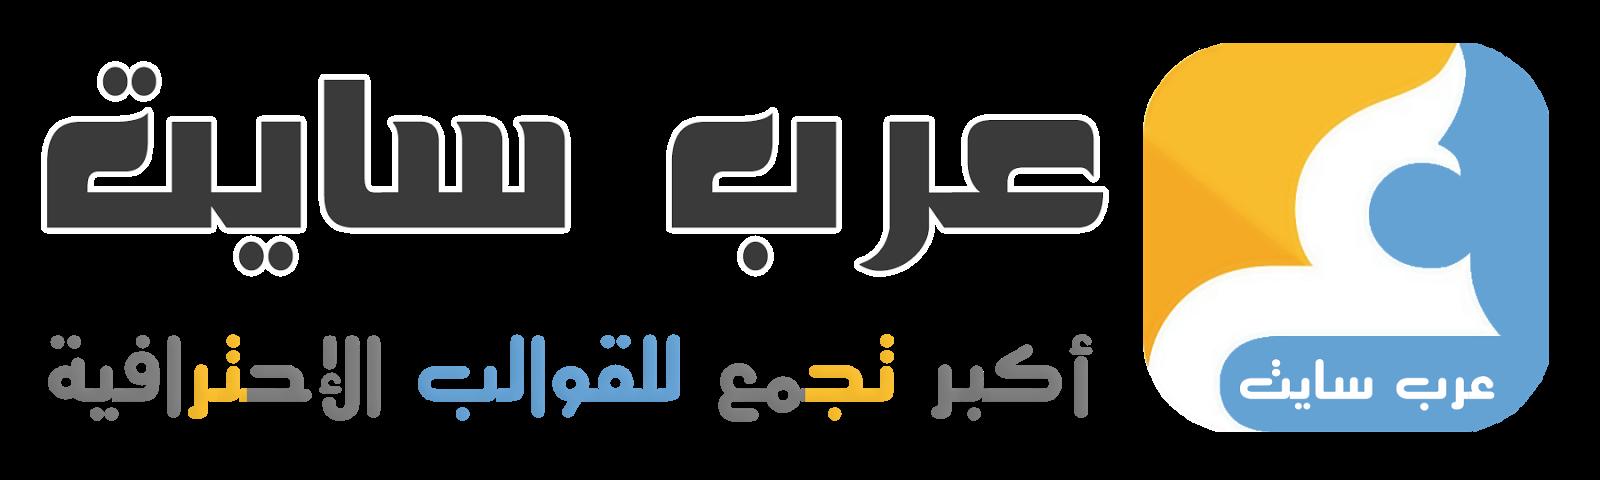 عرب سايت